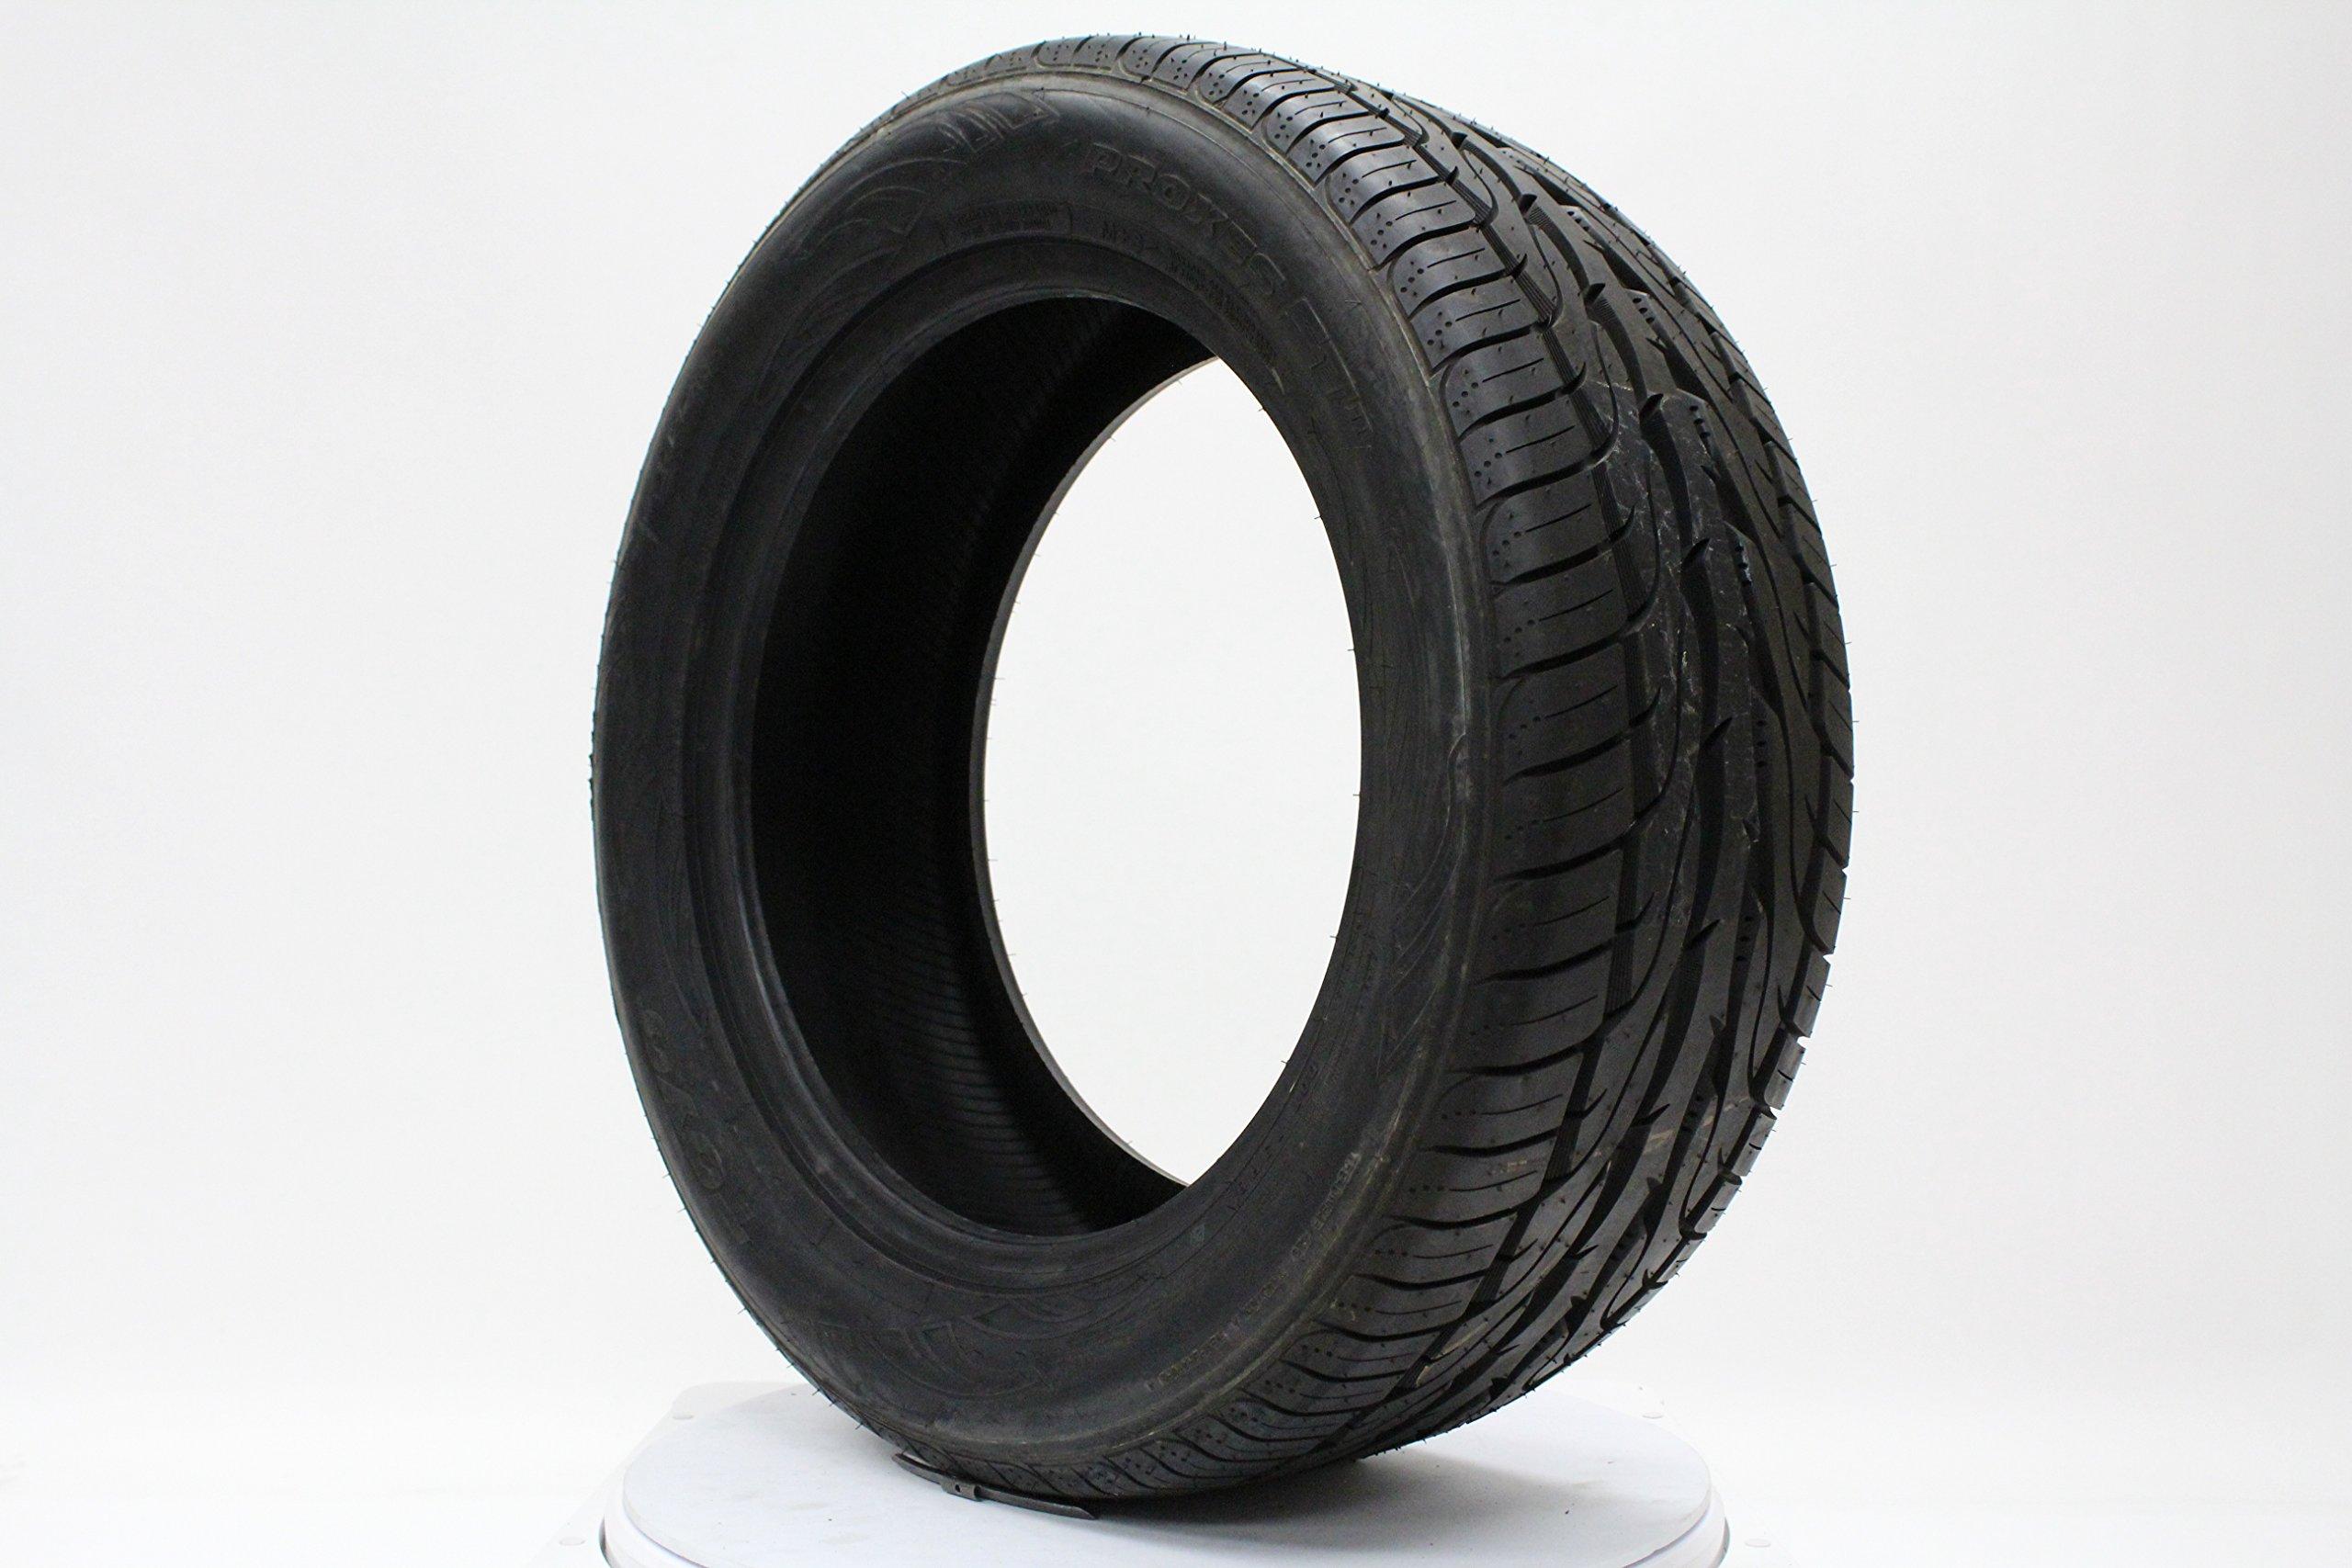 Toyo Proxes ST II All-Season Radial Tire - 255/55R19 111V